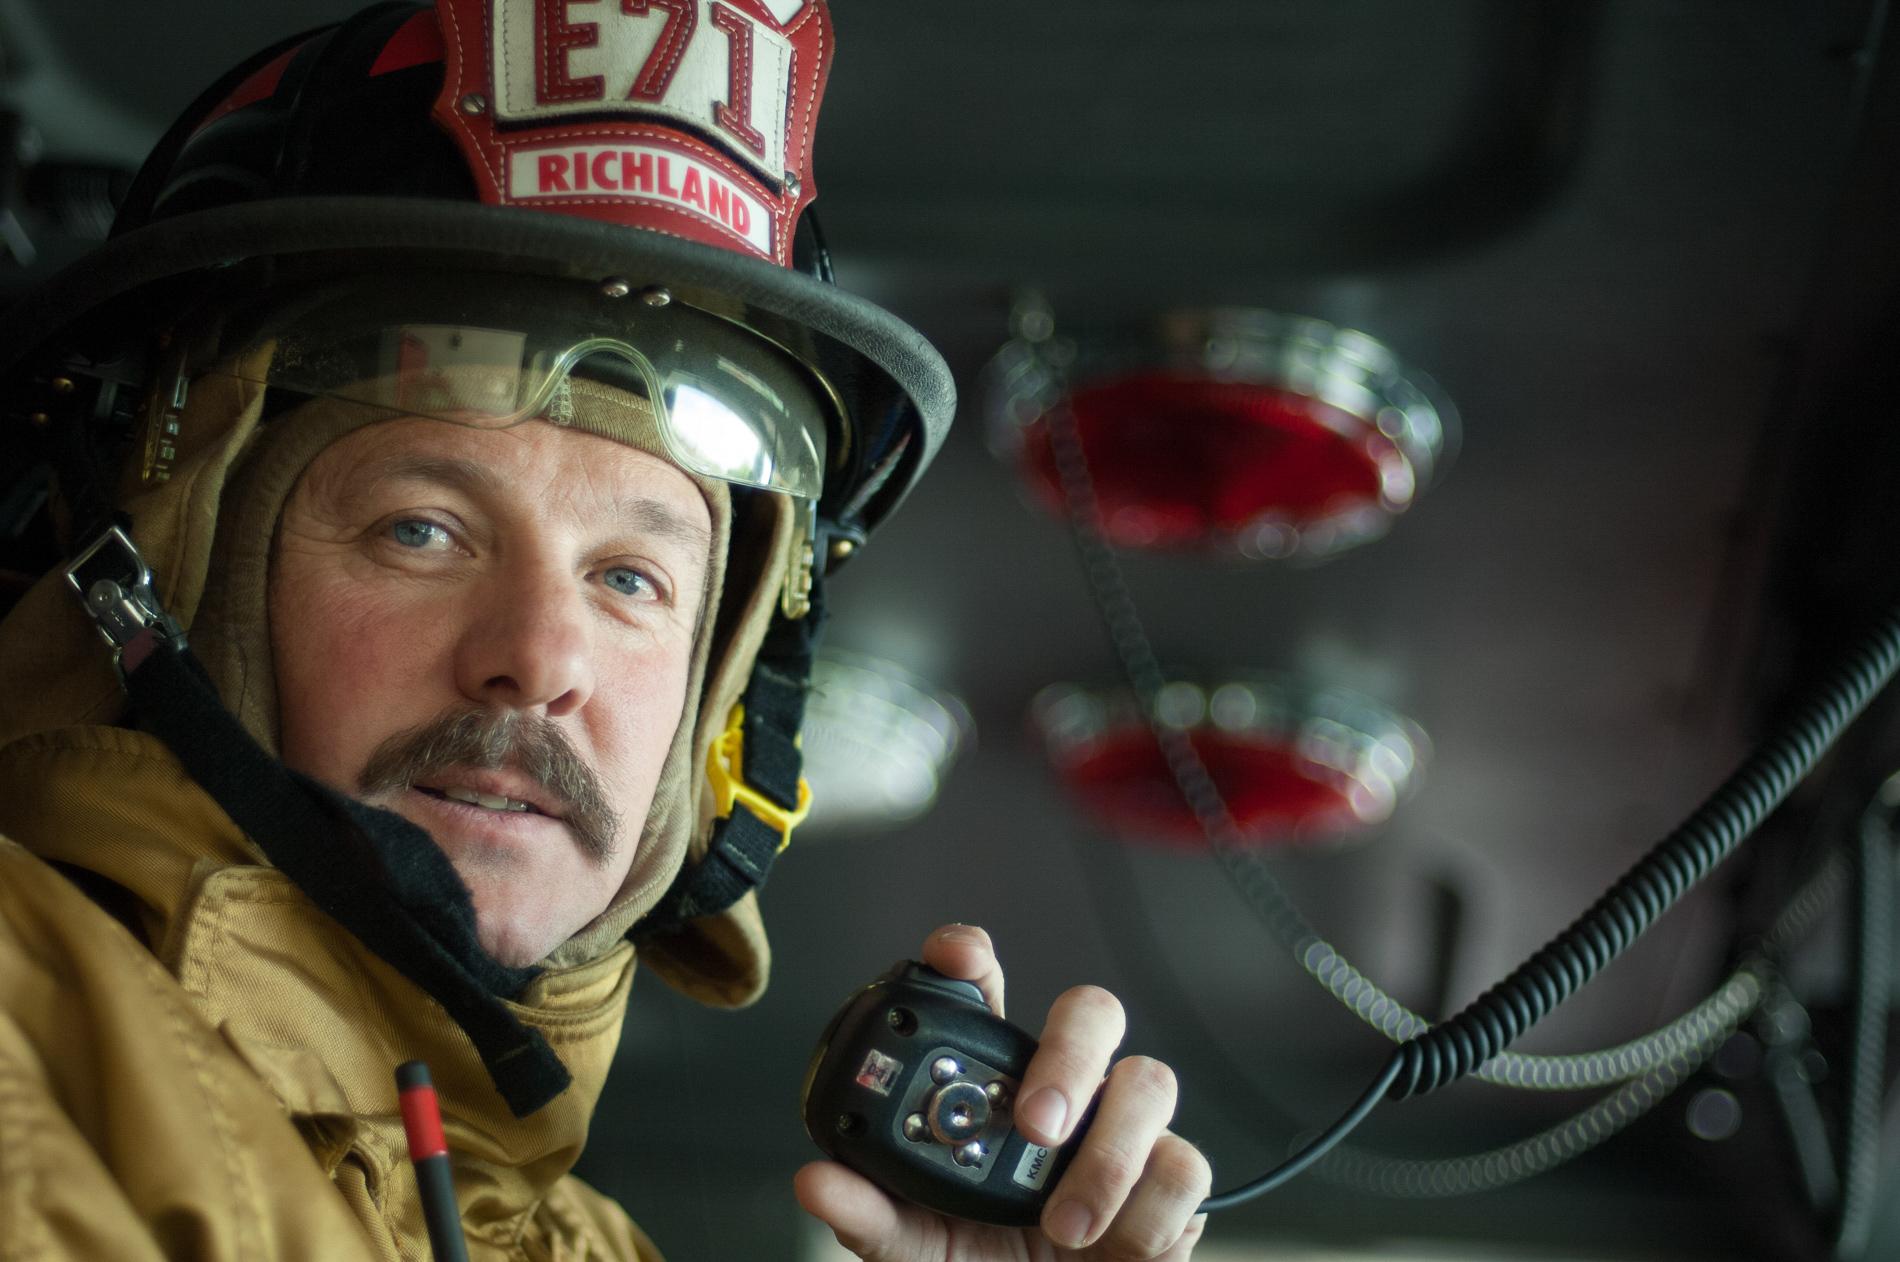 Firefighter Environmental Portrait